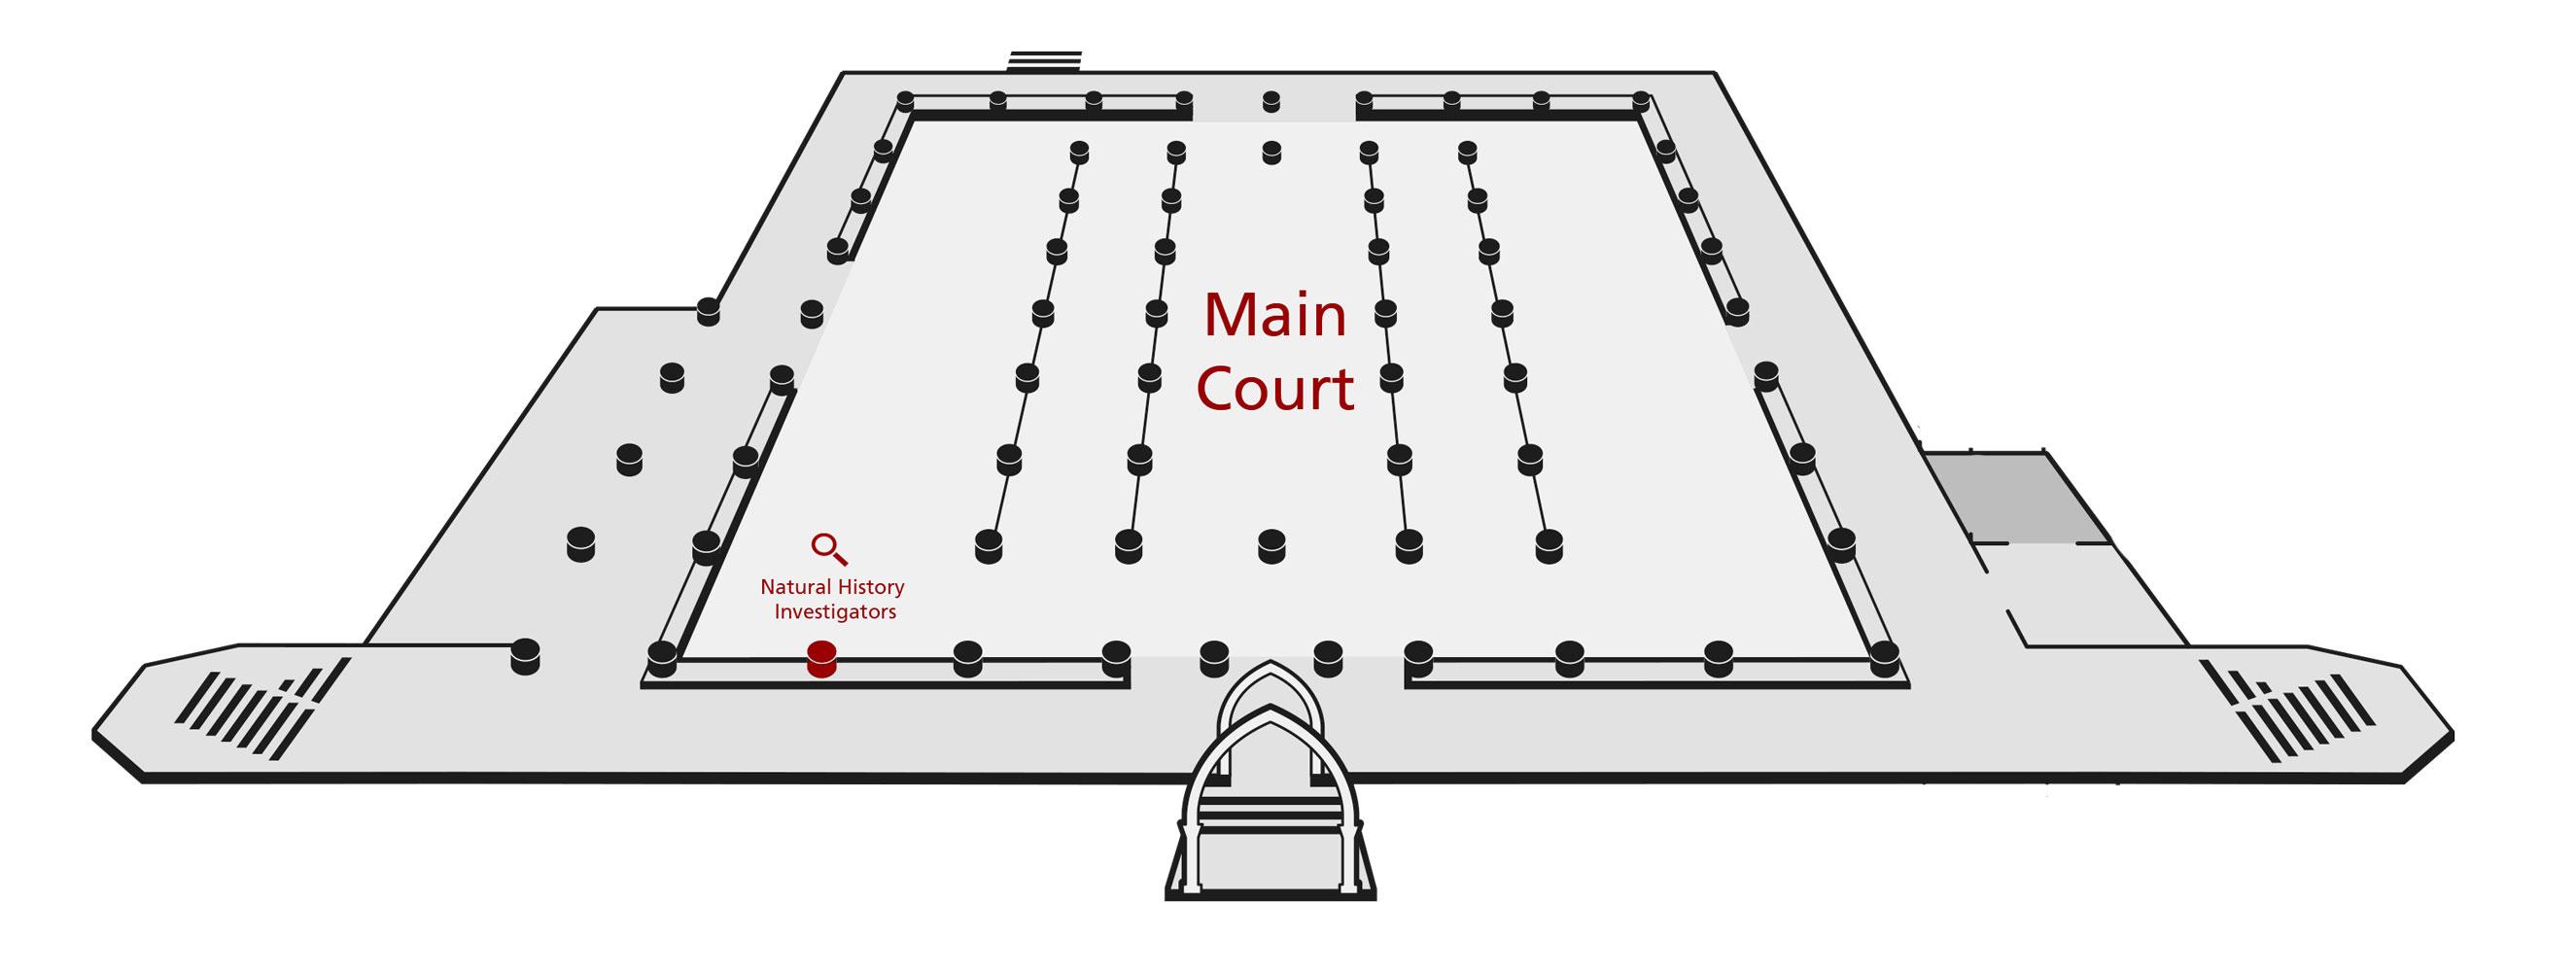 mnh floorplan main court commcase